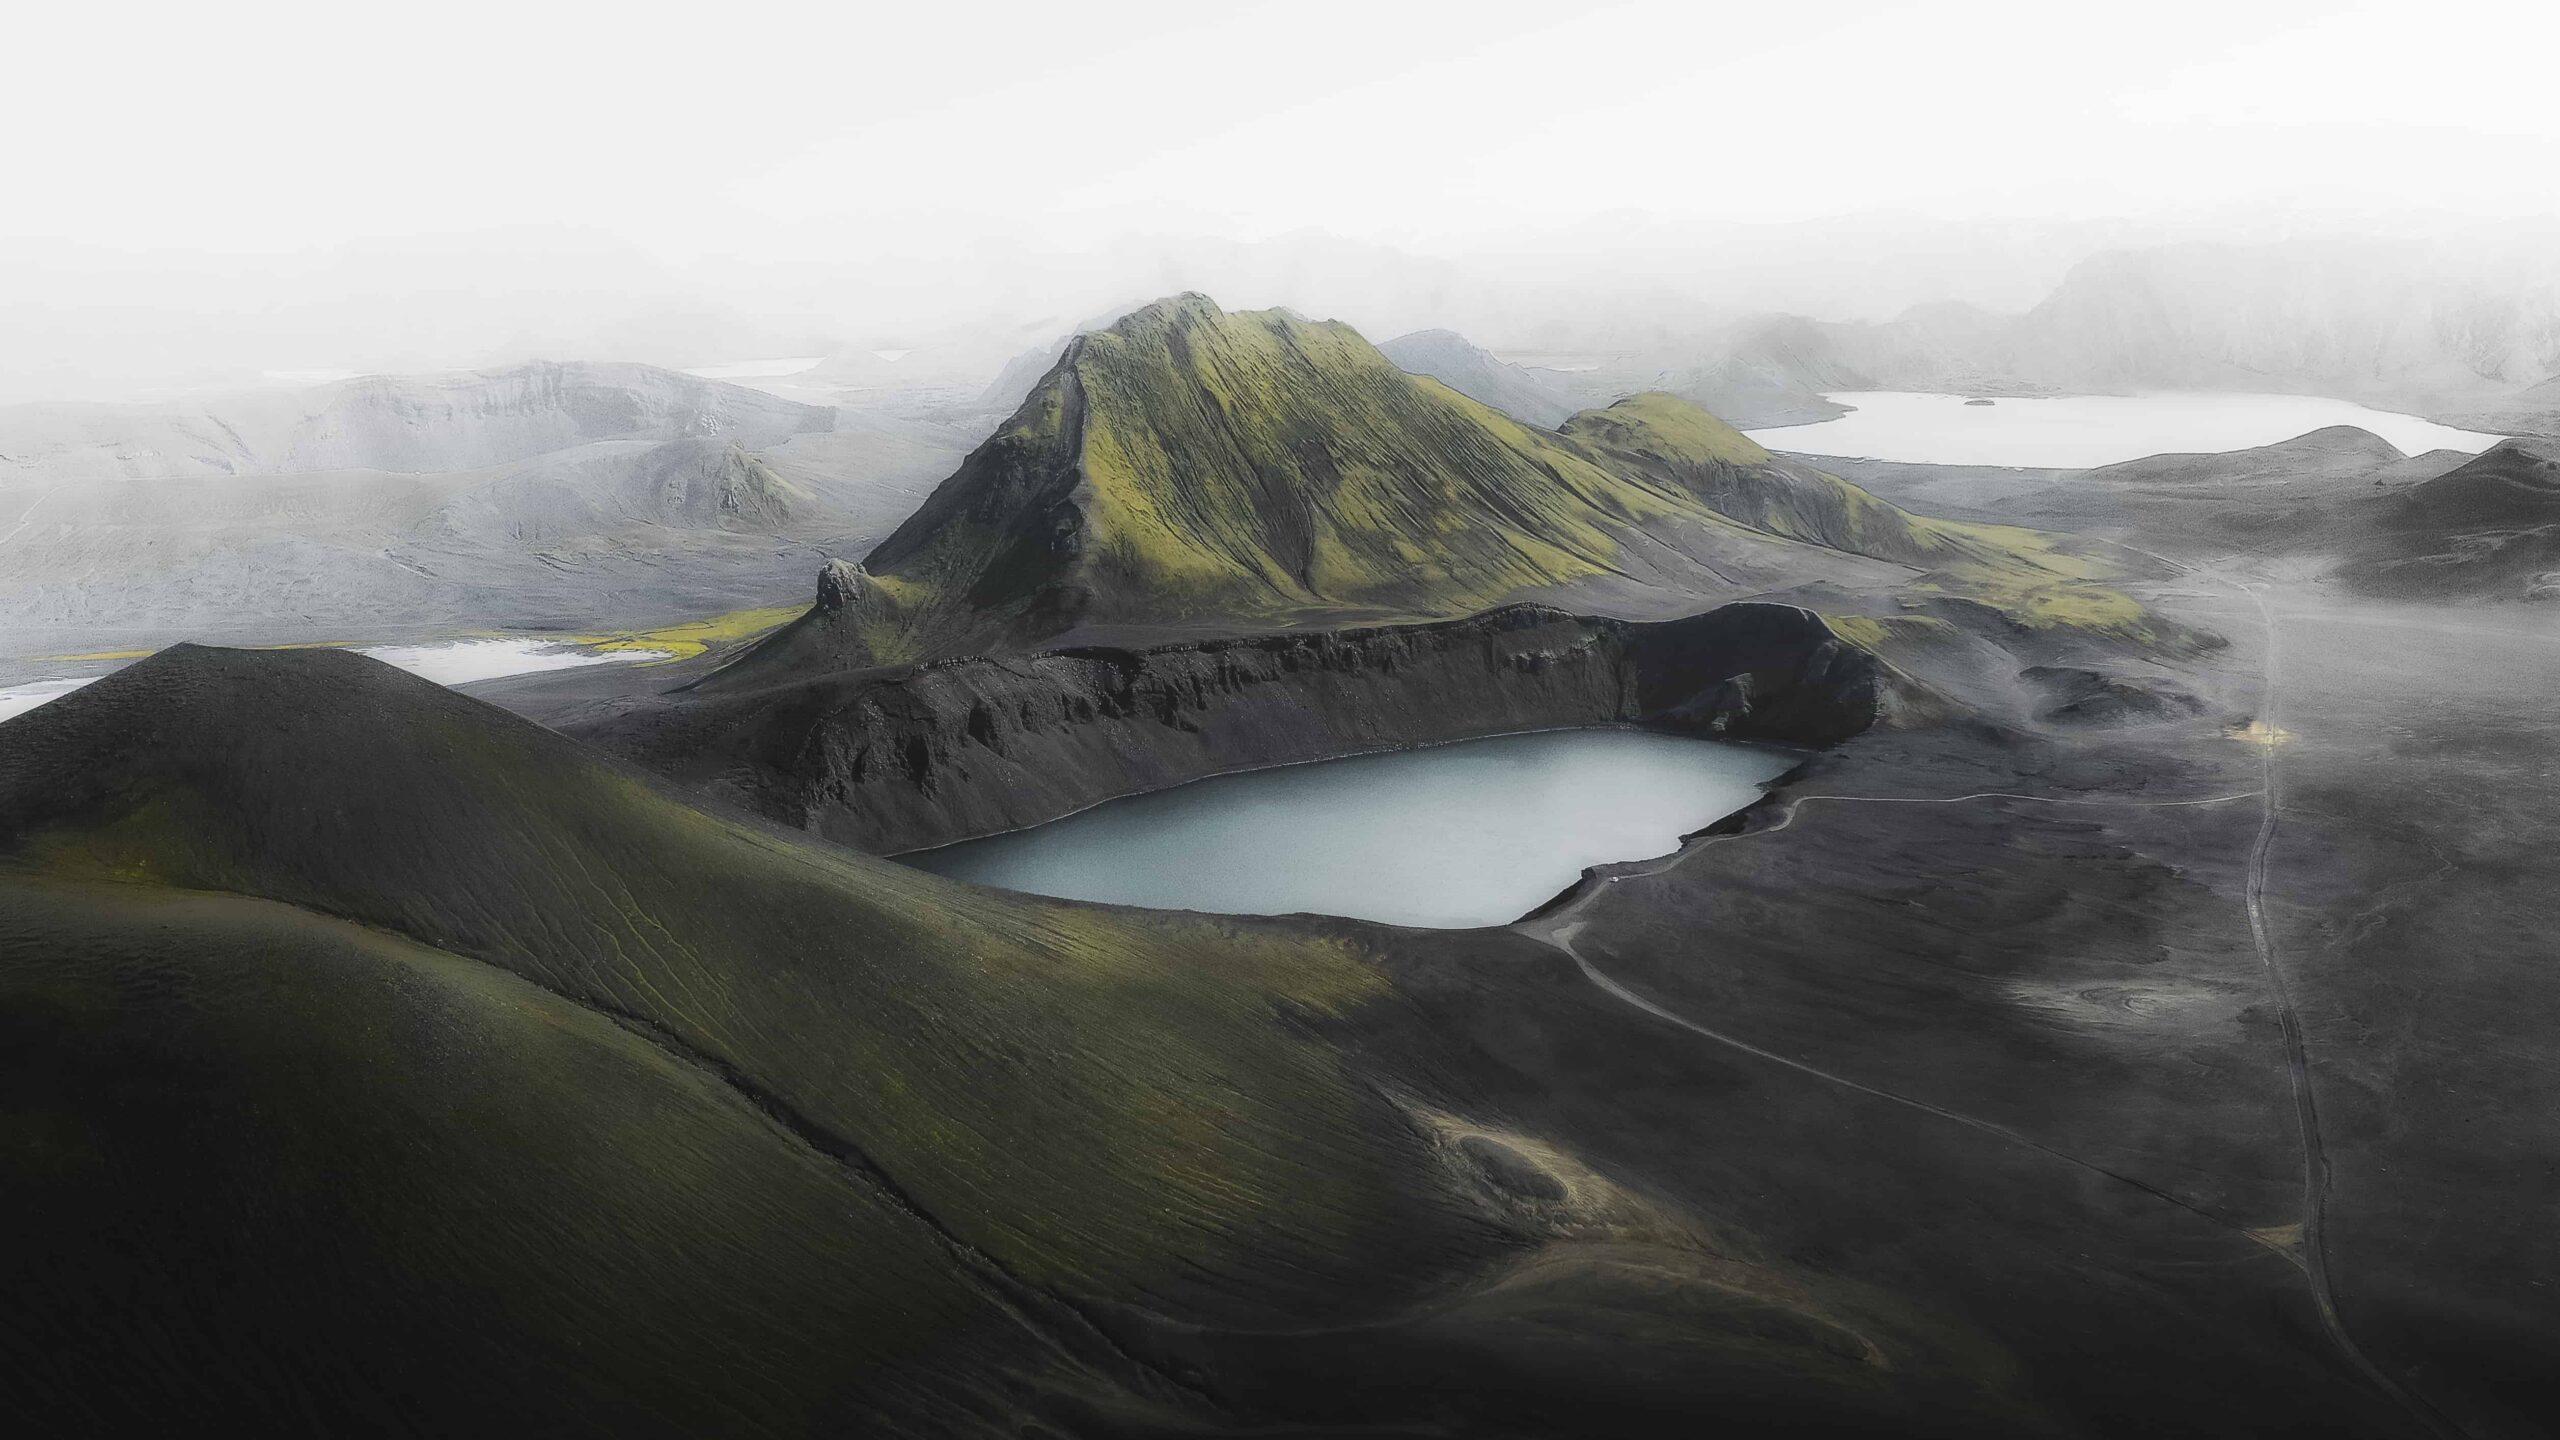 Drone flying in Iceland, Highlands, Ljótipollur Lake in Landmannalaugar